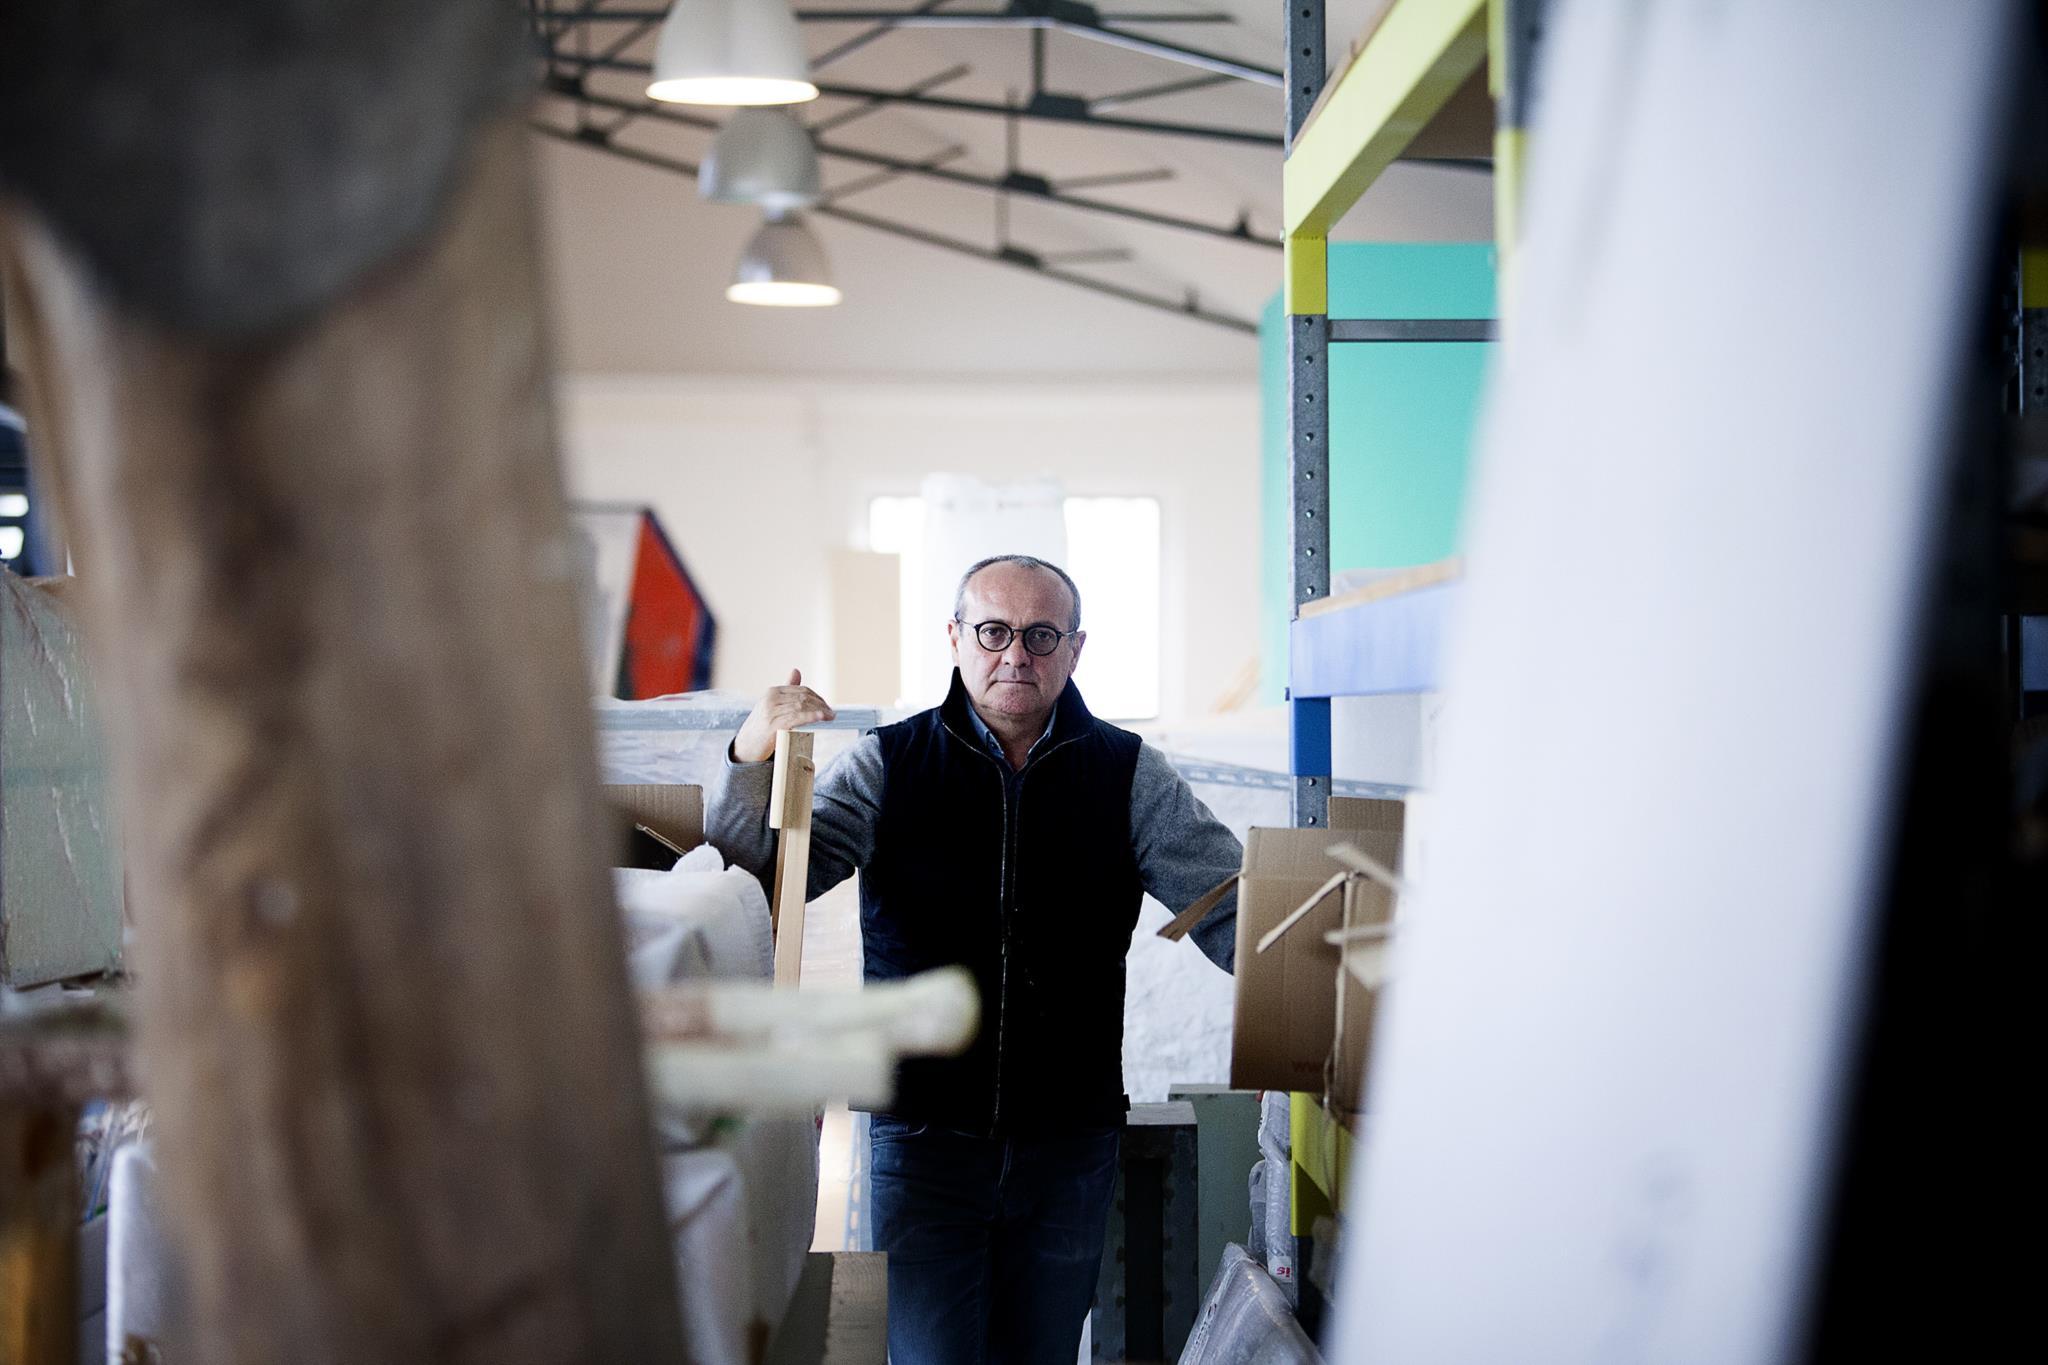 PÚBLICO - Museu Whitney vem a Lisboa visitar ateliers de artistas portugueses